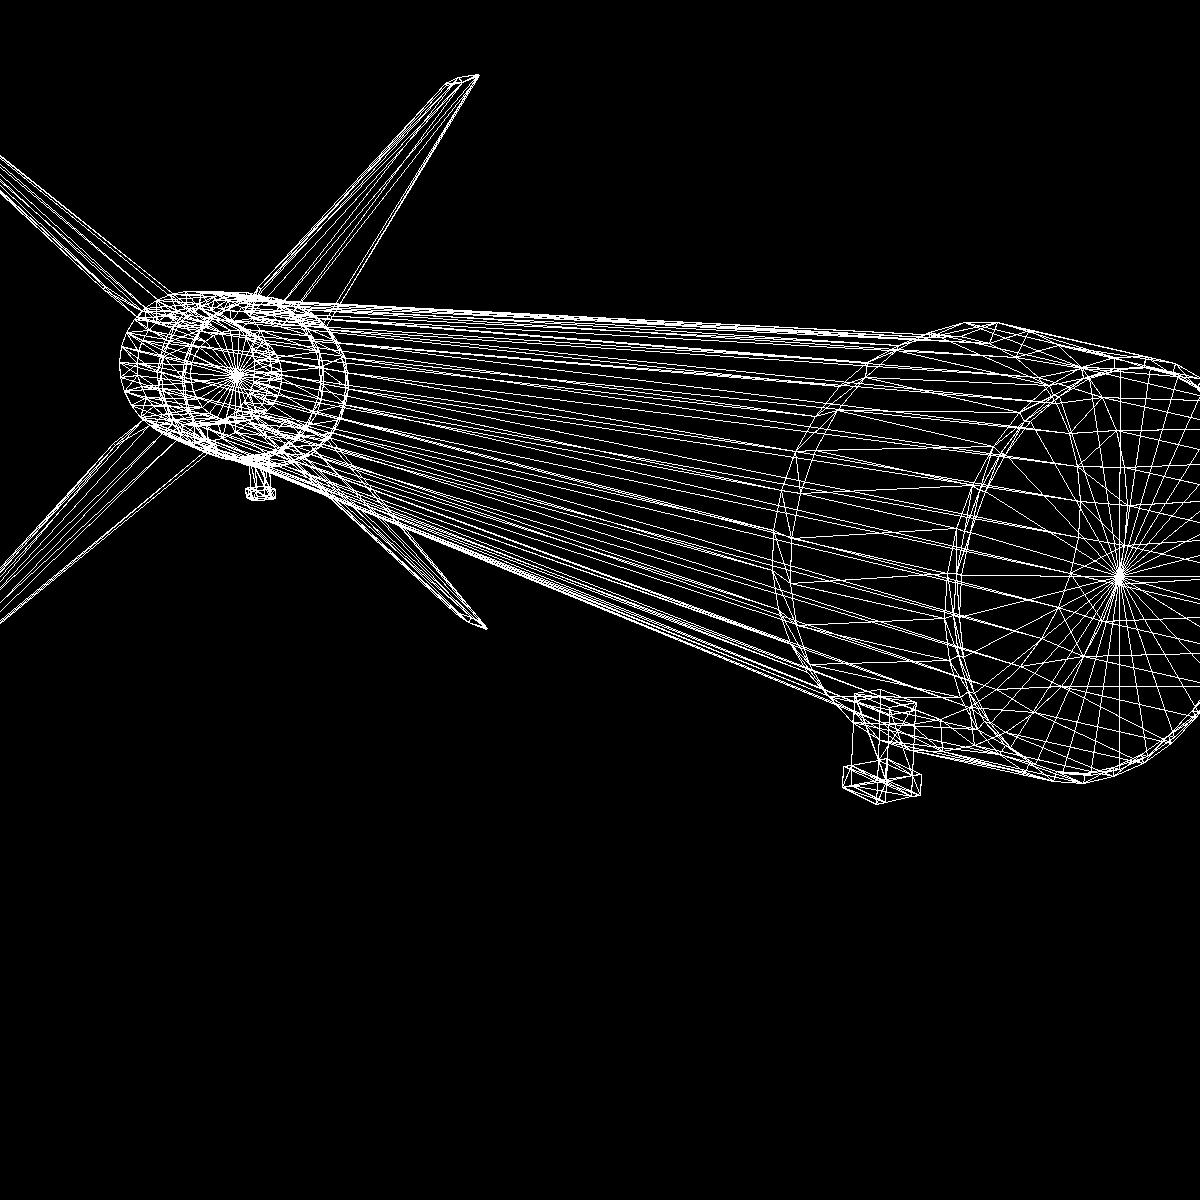 Astrobee 200 Rocket 3d model 3ds dxf fbx blend cob dae X   obj 165968